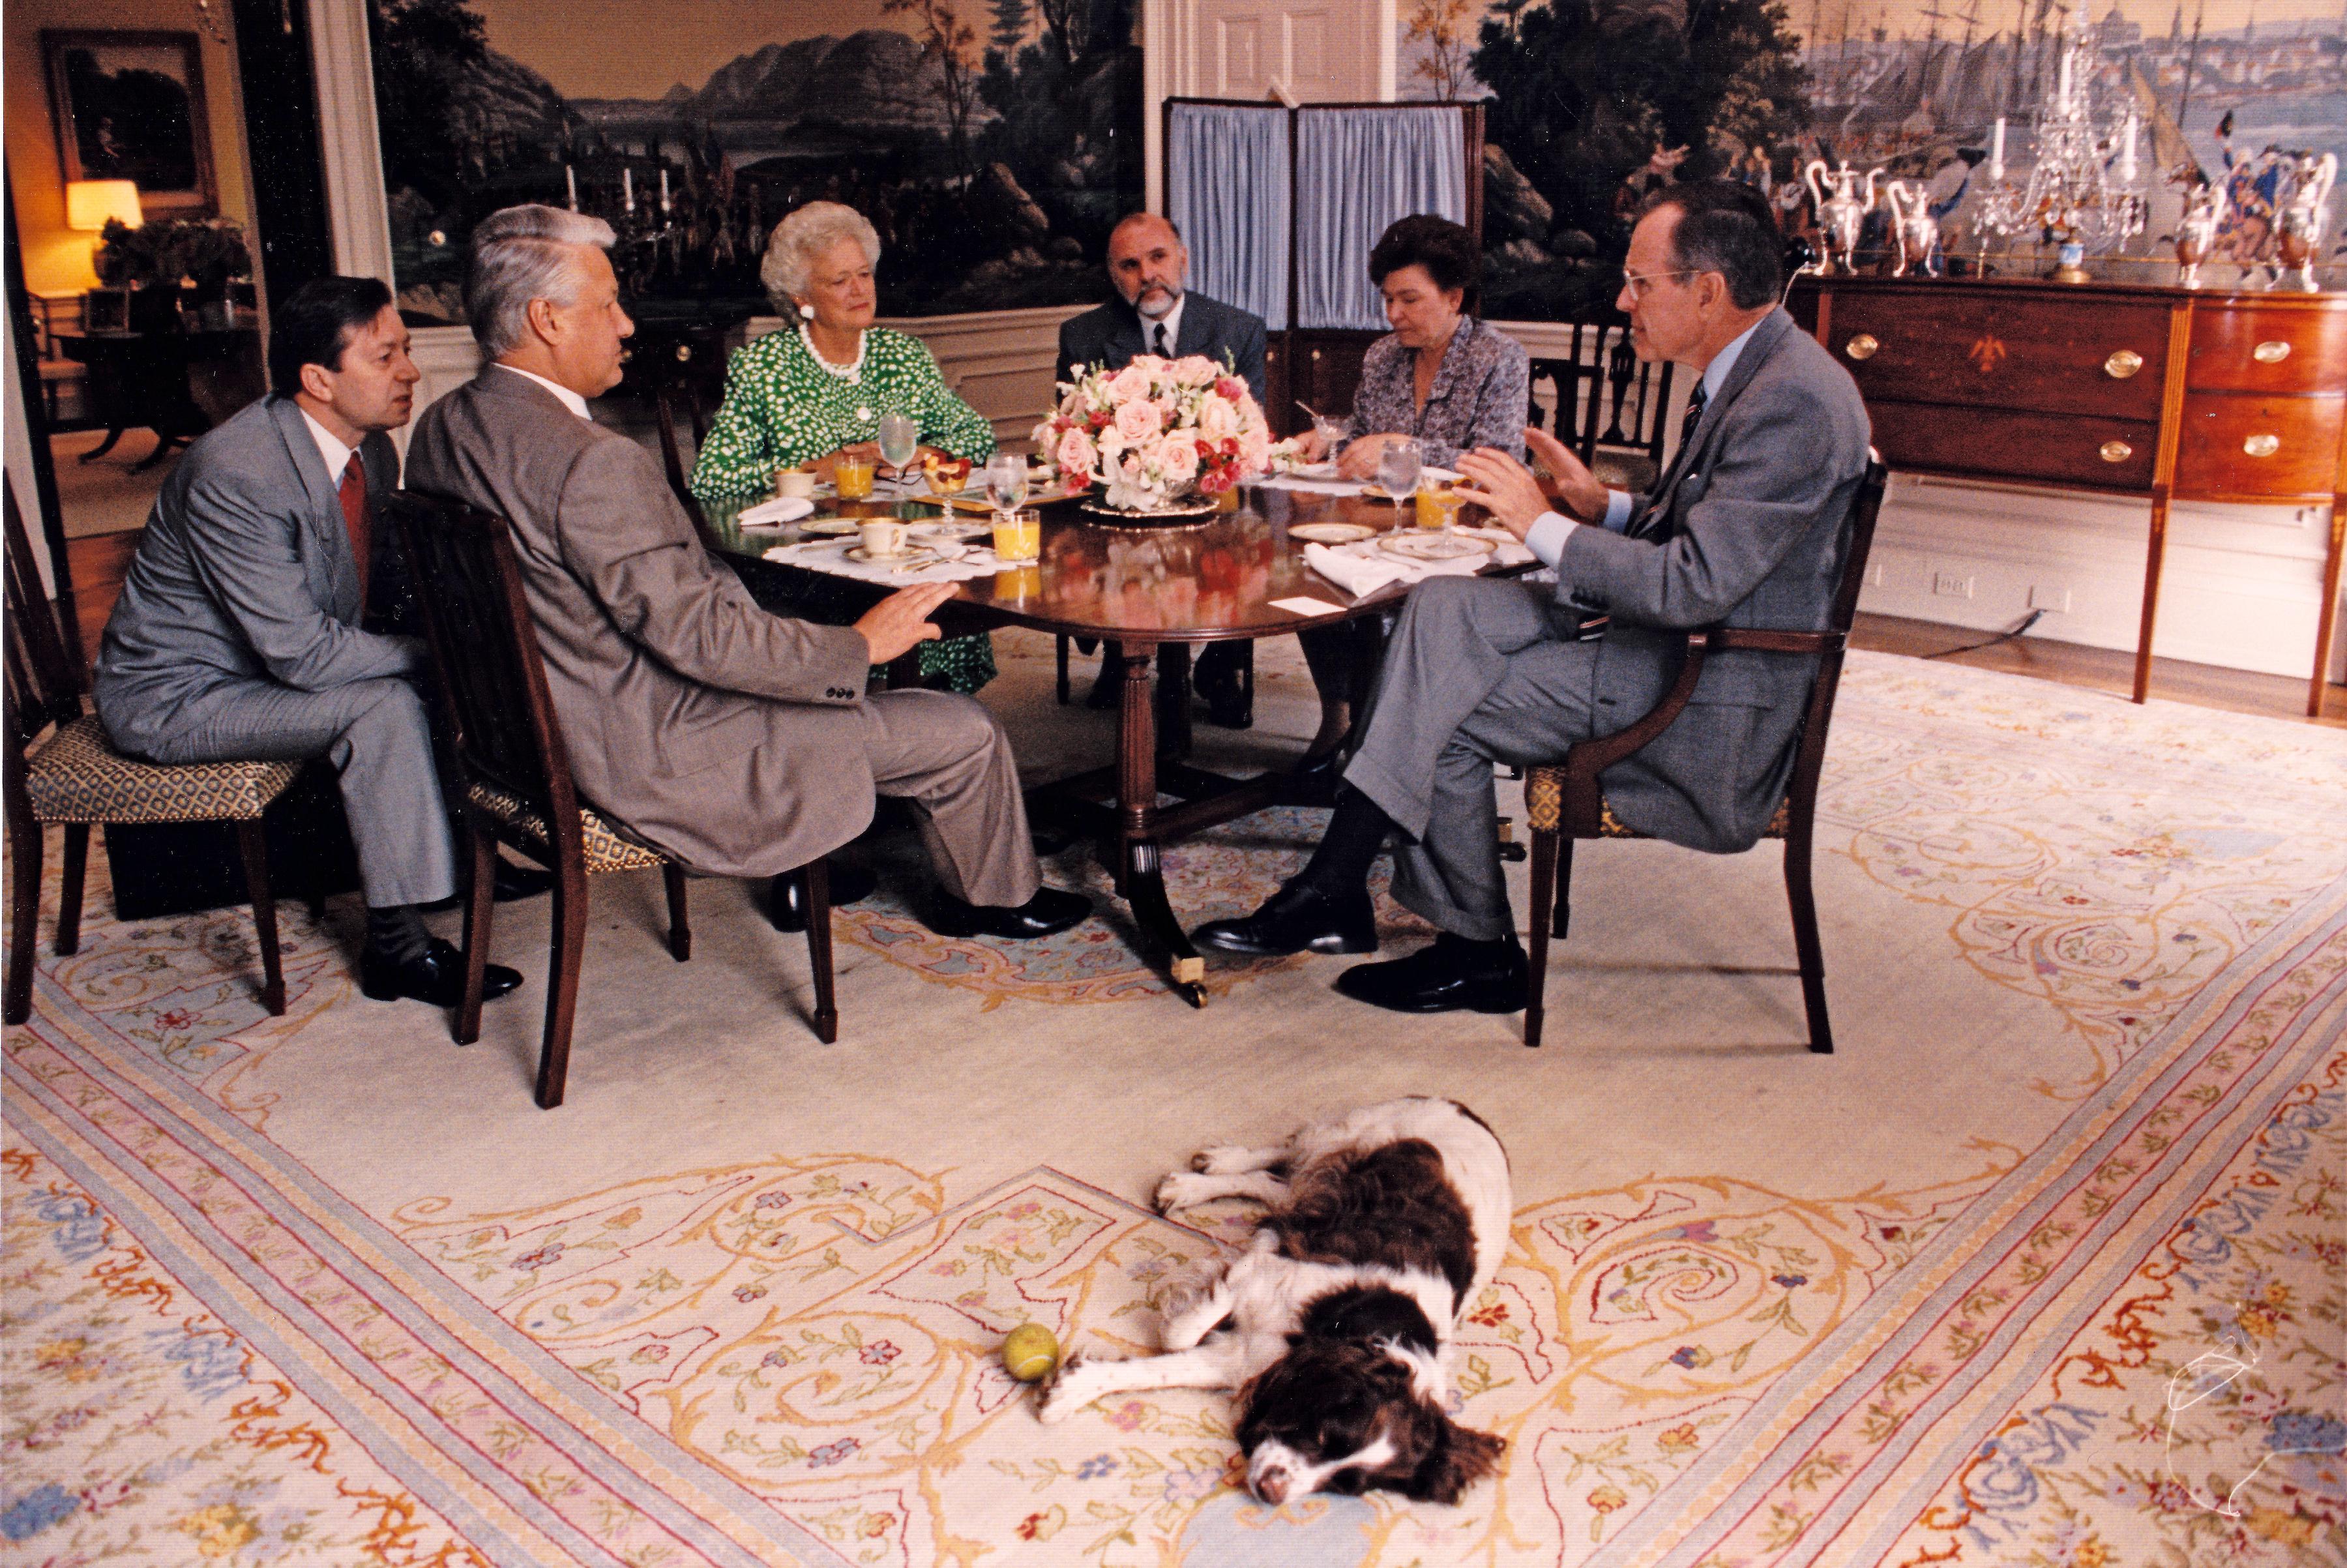 Barbara Bush, george h.w. bush and boris yeltsin